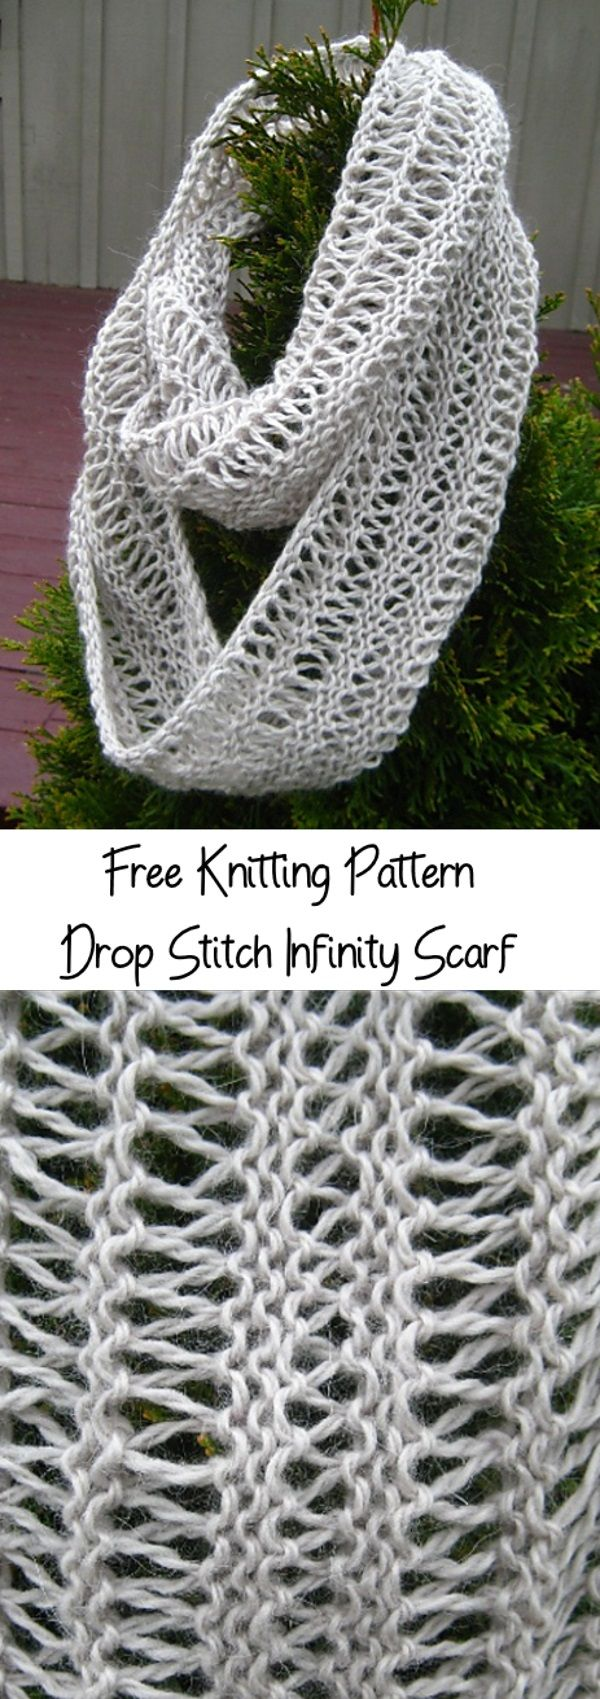 Foxy Loxy Fox Scarf Free Knitting Pattern Freeknittingpattern Scarfpattern